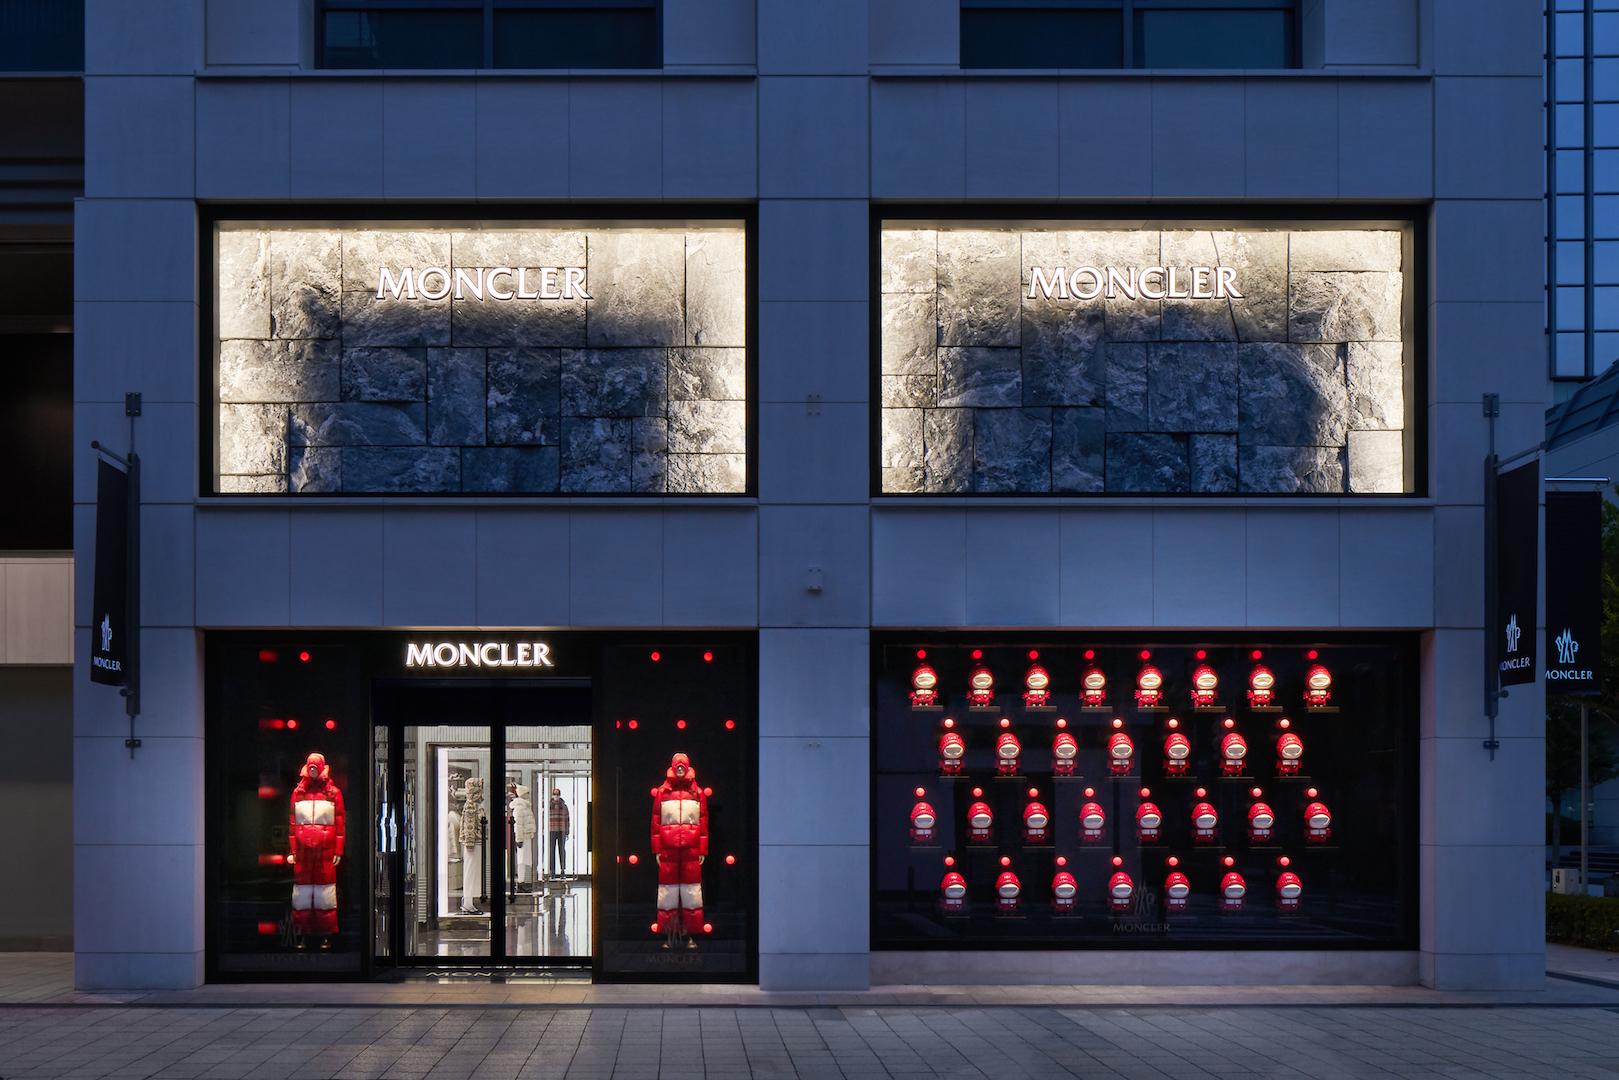 MONCLER new store in KOBE (Hyogo)